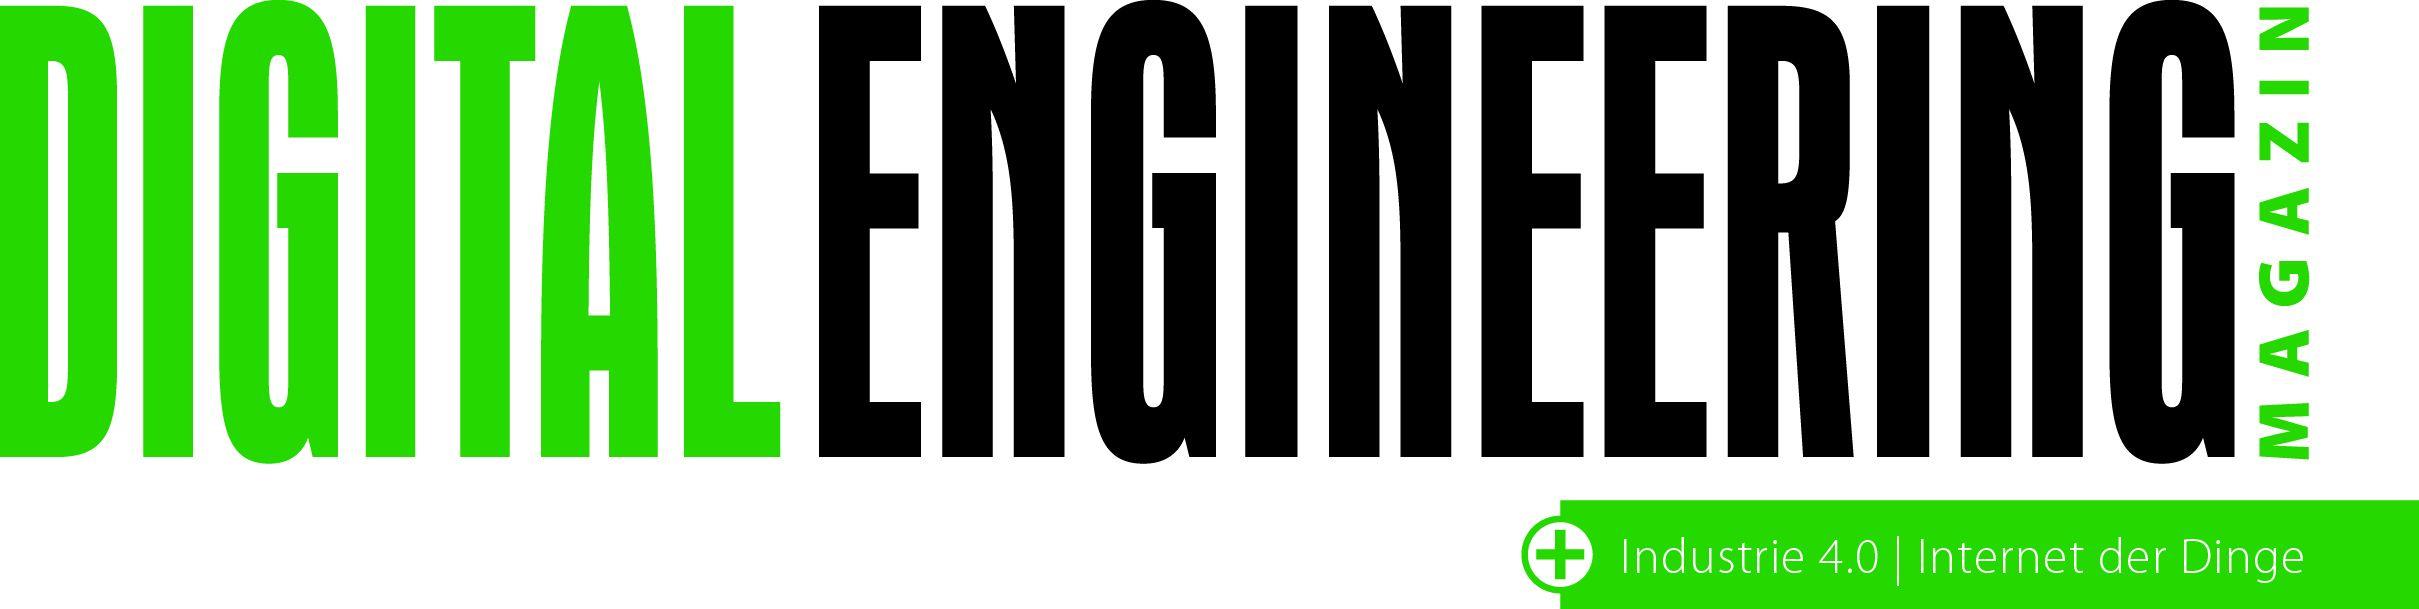 Logo Digital Engineering